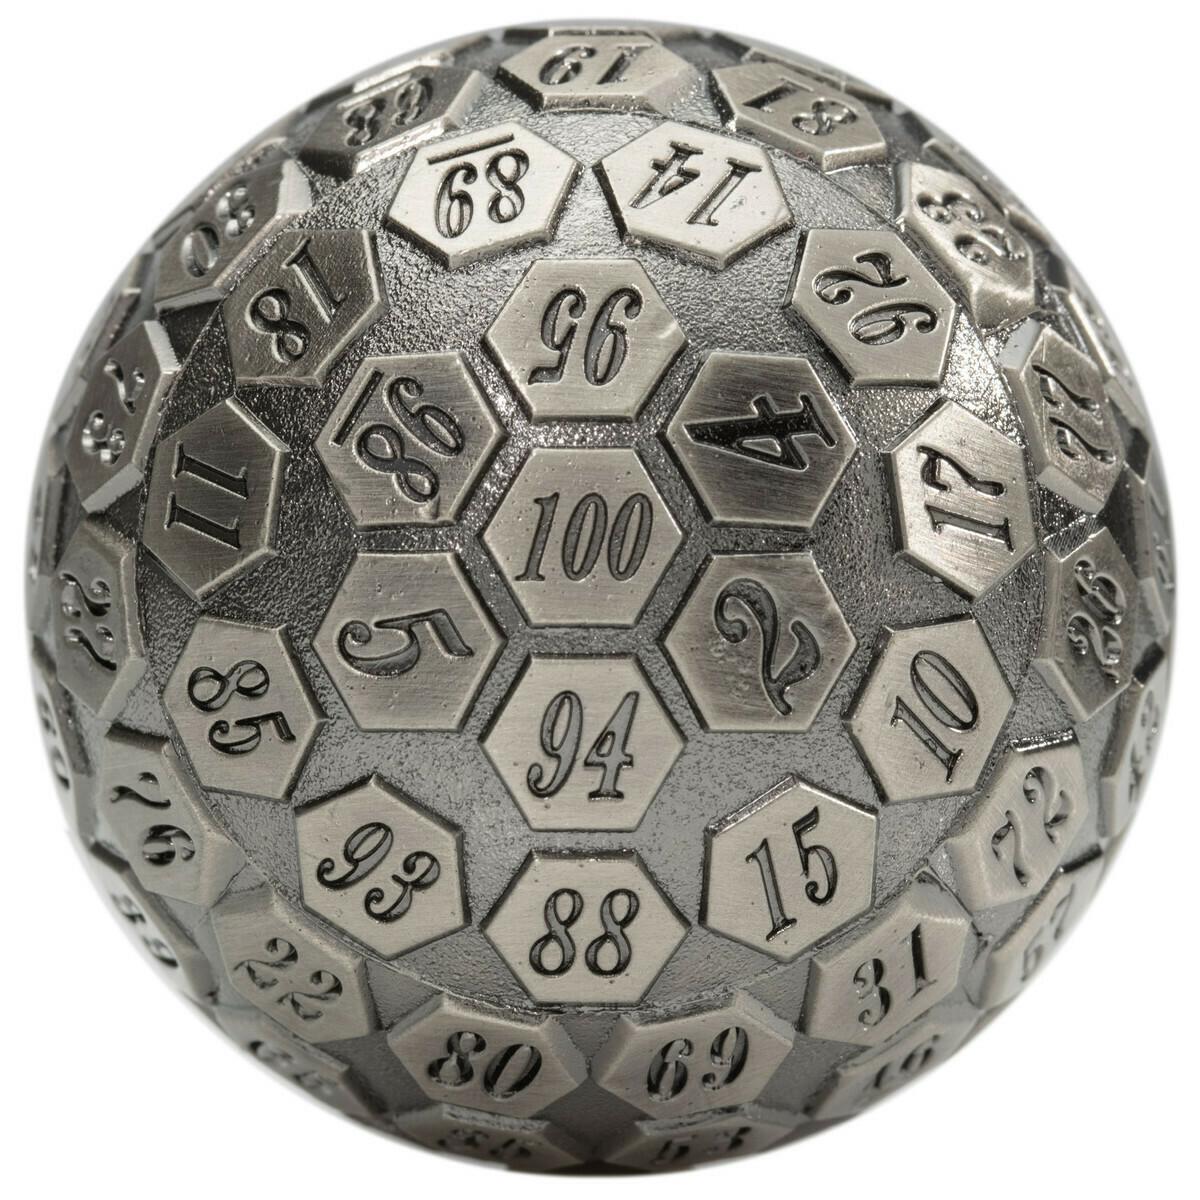 45MM Metal D100 Die - Orb of Predestined Fate - Ancient Silver  RPG Tabletop